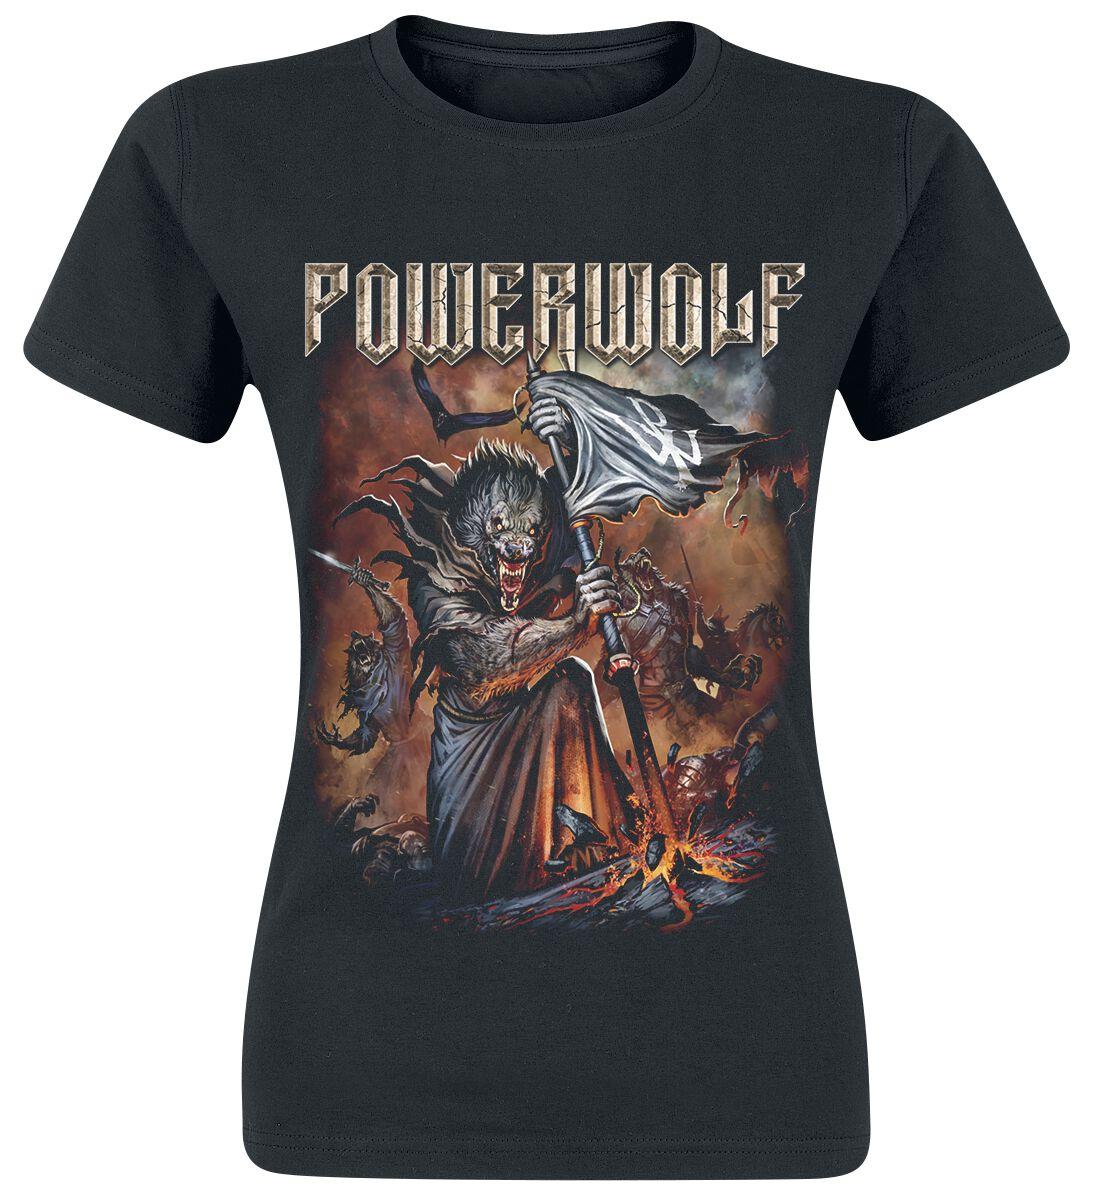 Image of   Powerwolf Wolfsnächte 2018 Girlie trøje sort